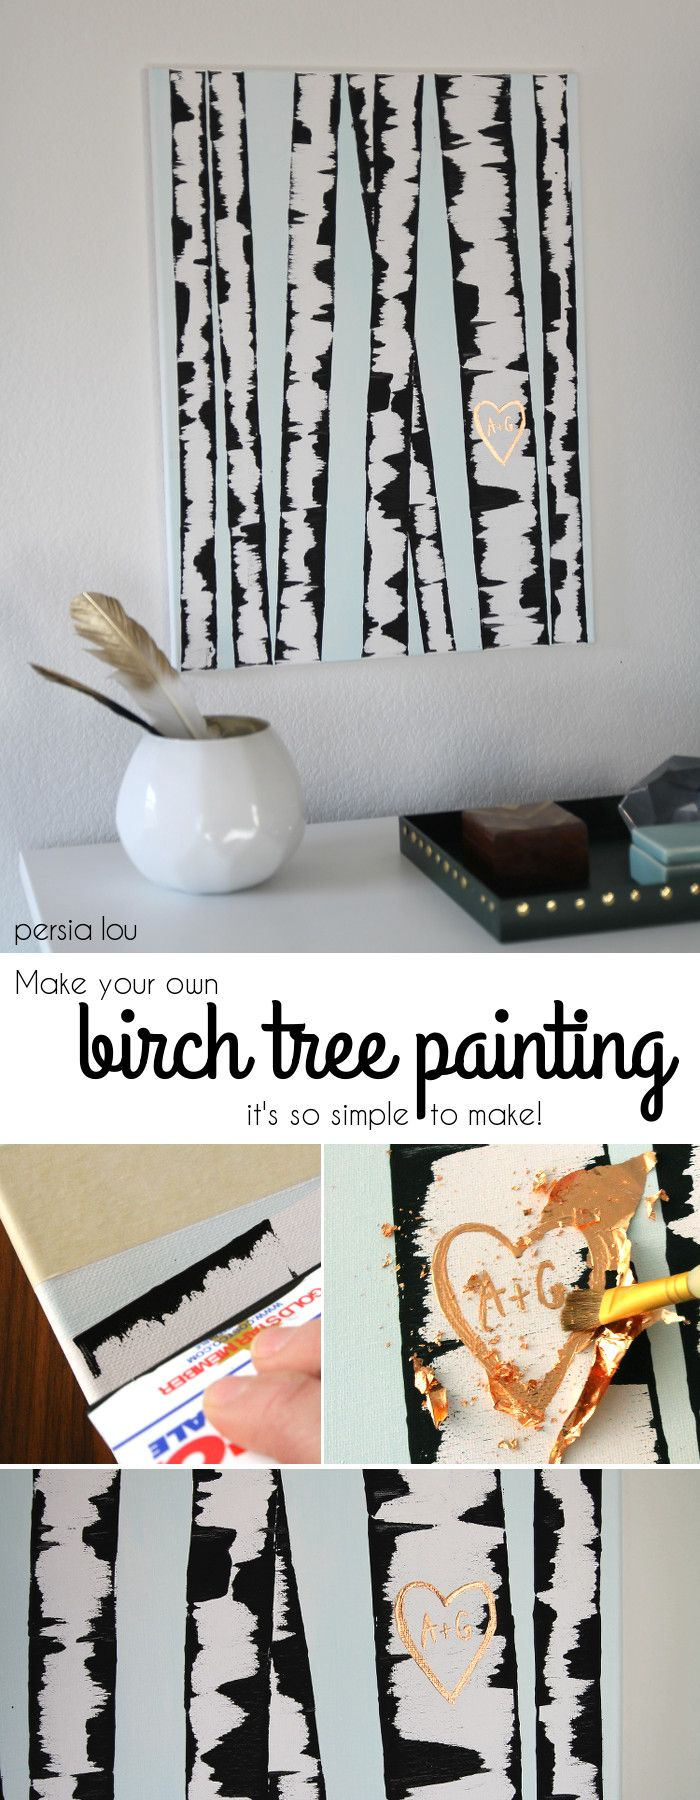 Cheap and Easy Homemade Wall Art Design | http://diyready.com/diy-wall-art-you-can-make-in-under-an-hour/